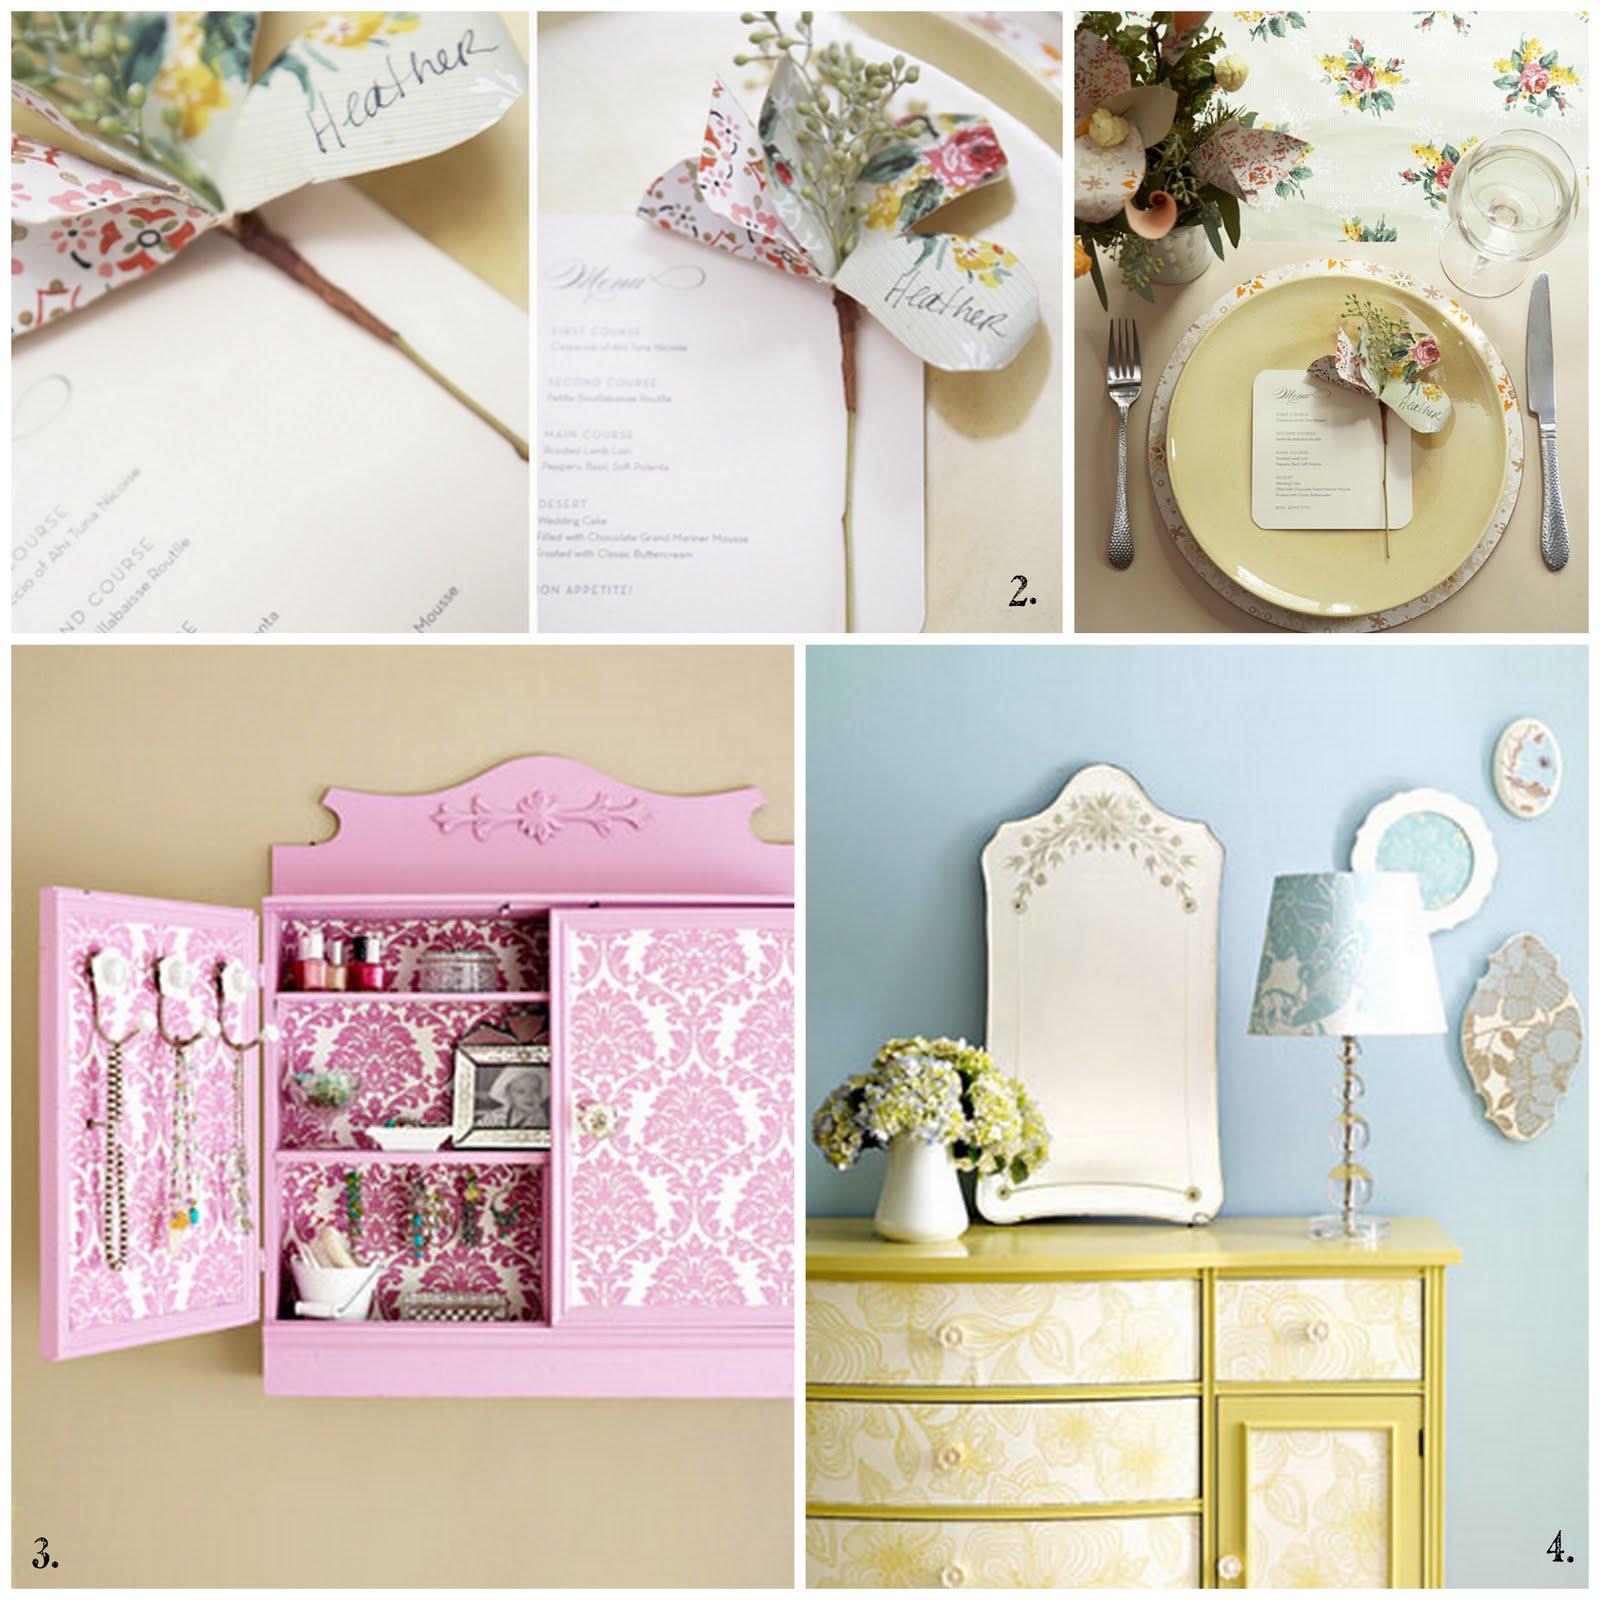 http://2.bp.blogspot.com/_Q0EnxCRe6gA/S9UCz68riaI/AAAAAAAAGWU/8pFKTVLxbPM/s1600/Wallpaper+Ideas+1.jpg